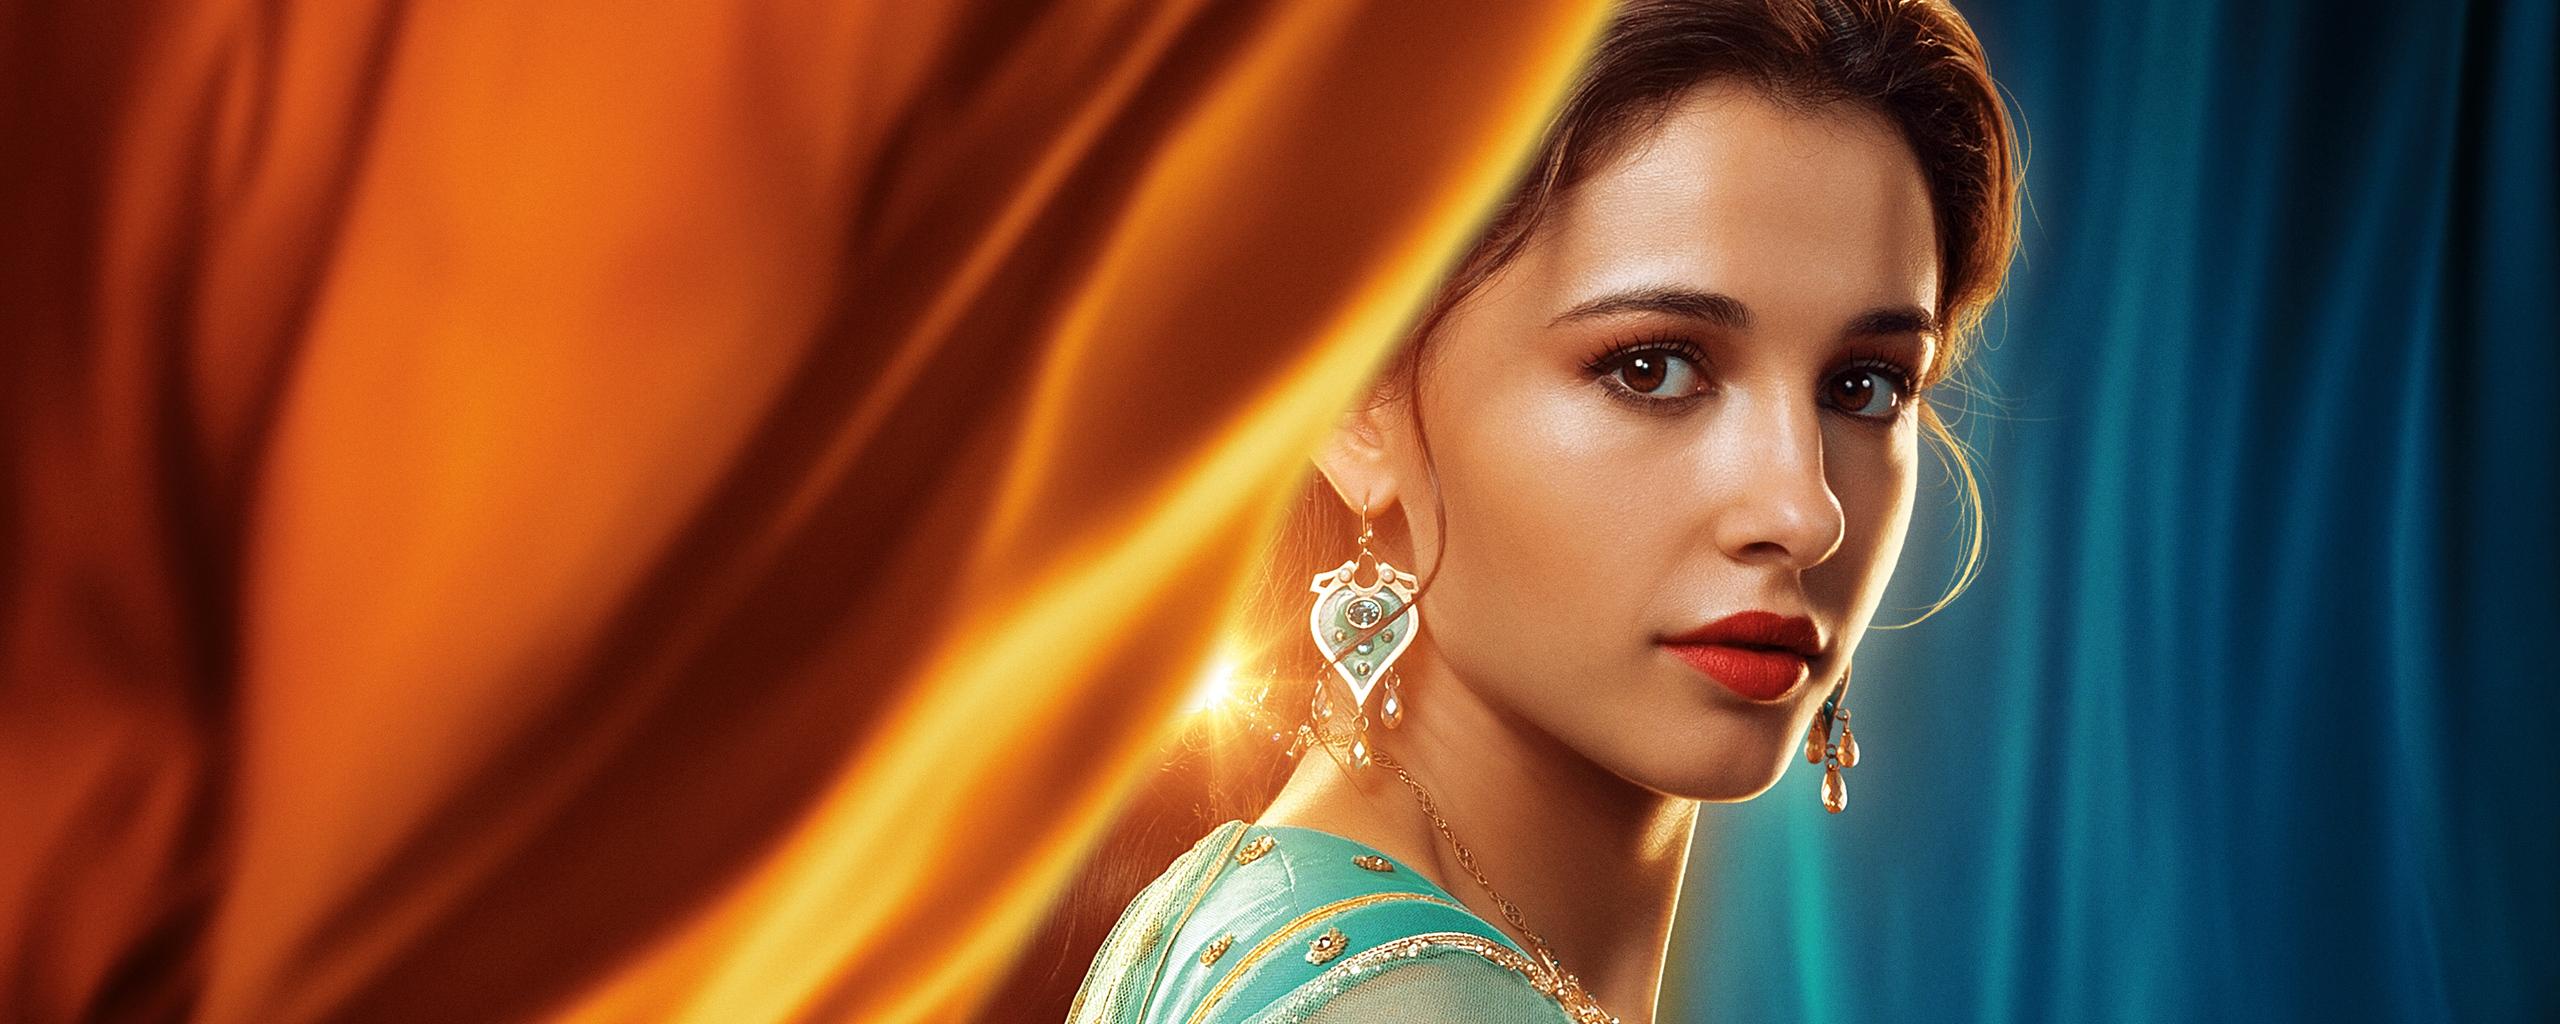 princess-jasmine-in-aladdin-2019-5k-ky.jpg